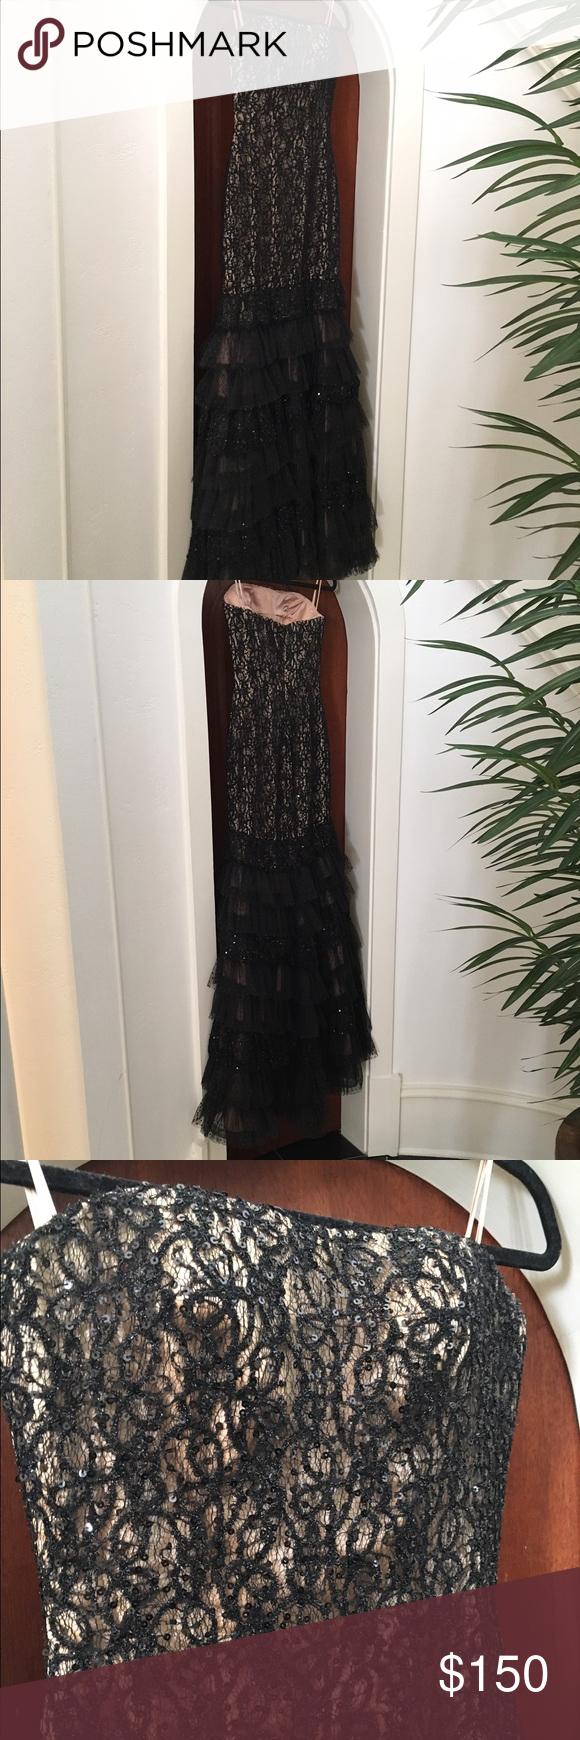 Jovani ny black strapless eveningprom gown sz hollywood glamour